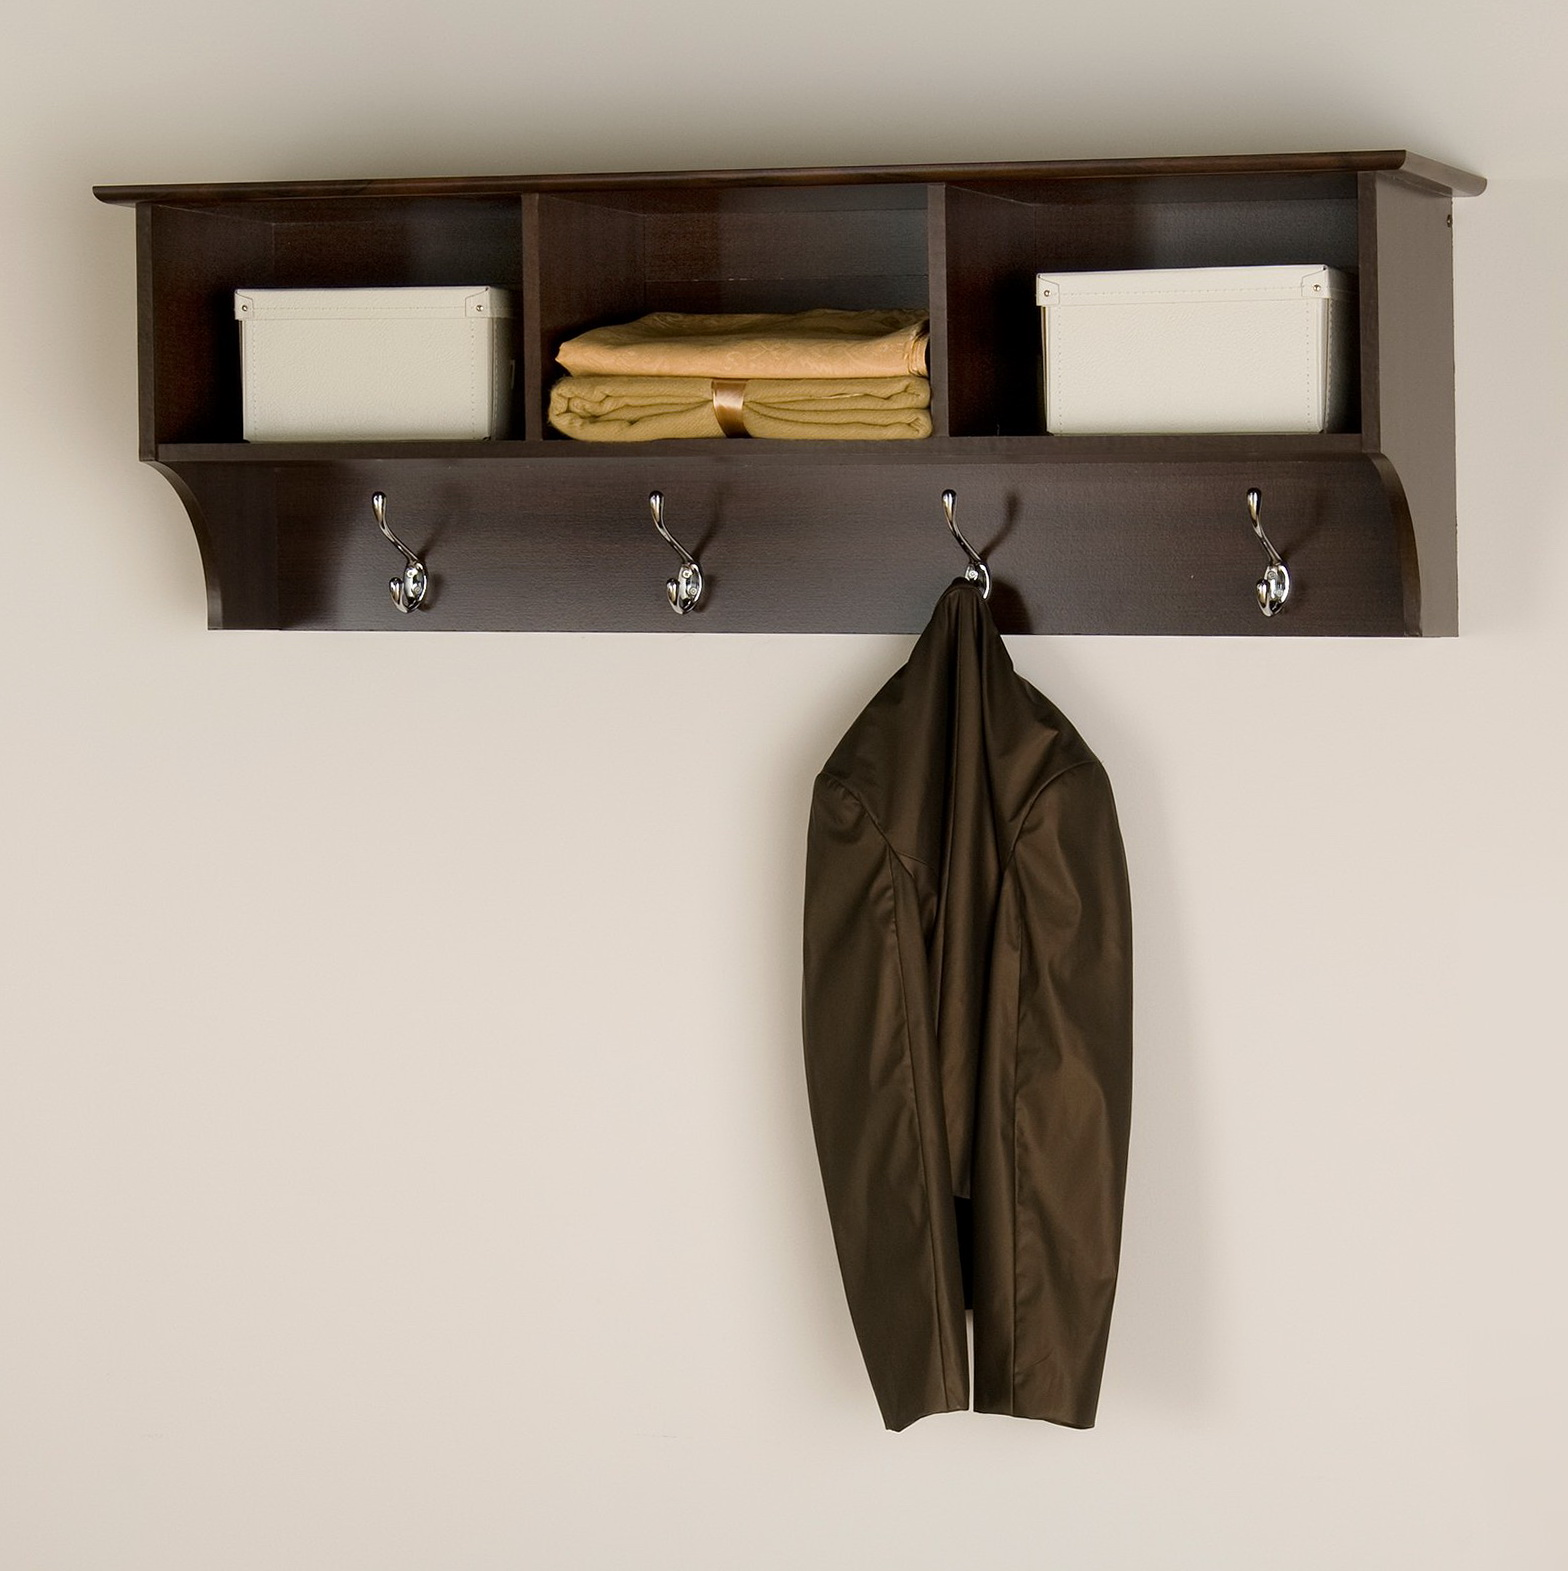 How To Make A Wall Coat Rack With Shelf